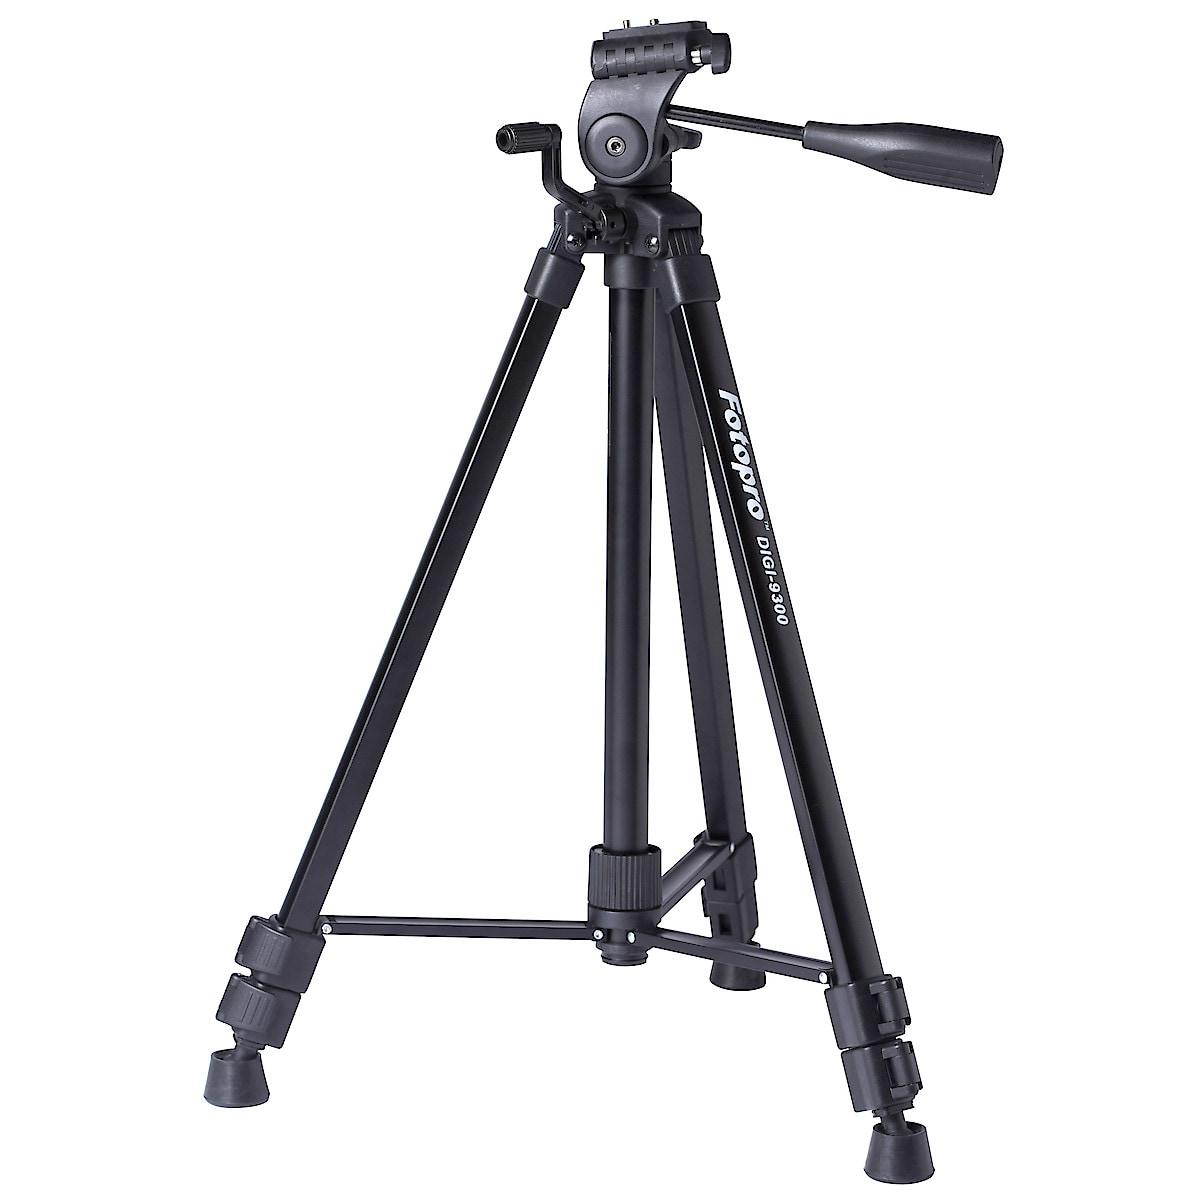 Kamerastativ Rollei Compact Traveler Star S2